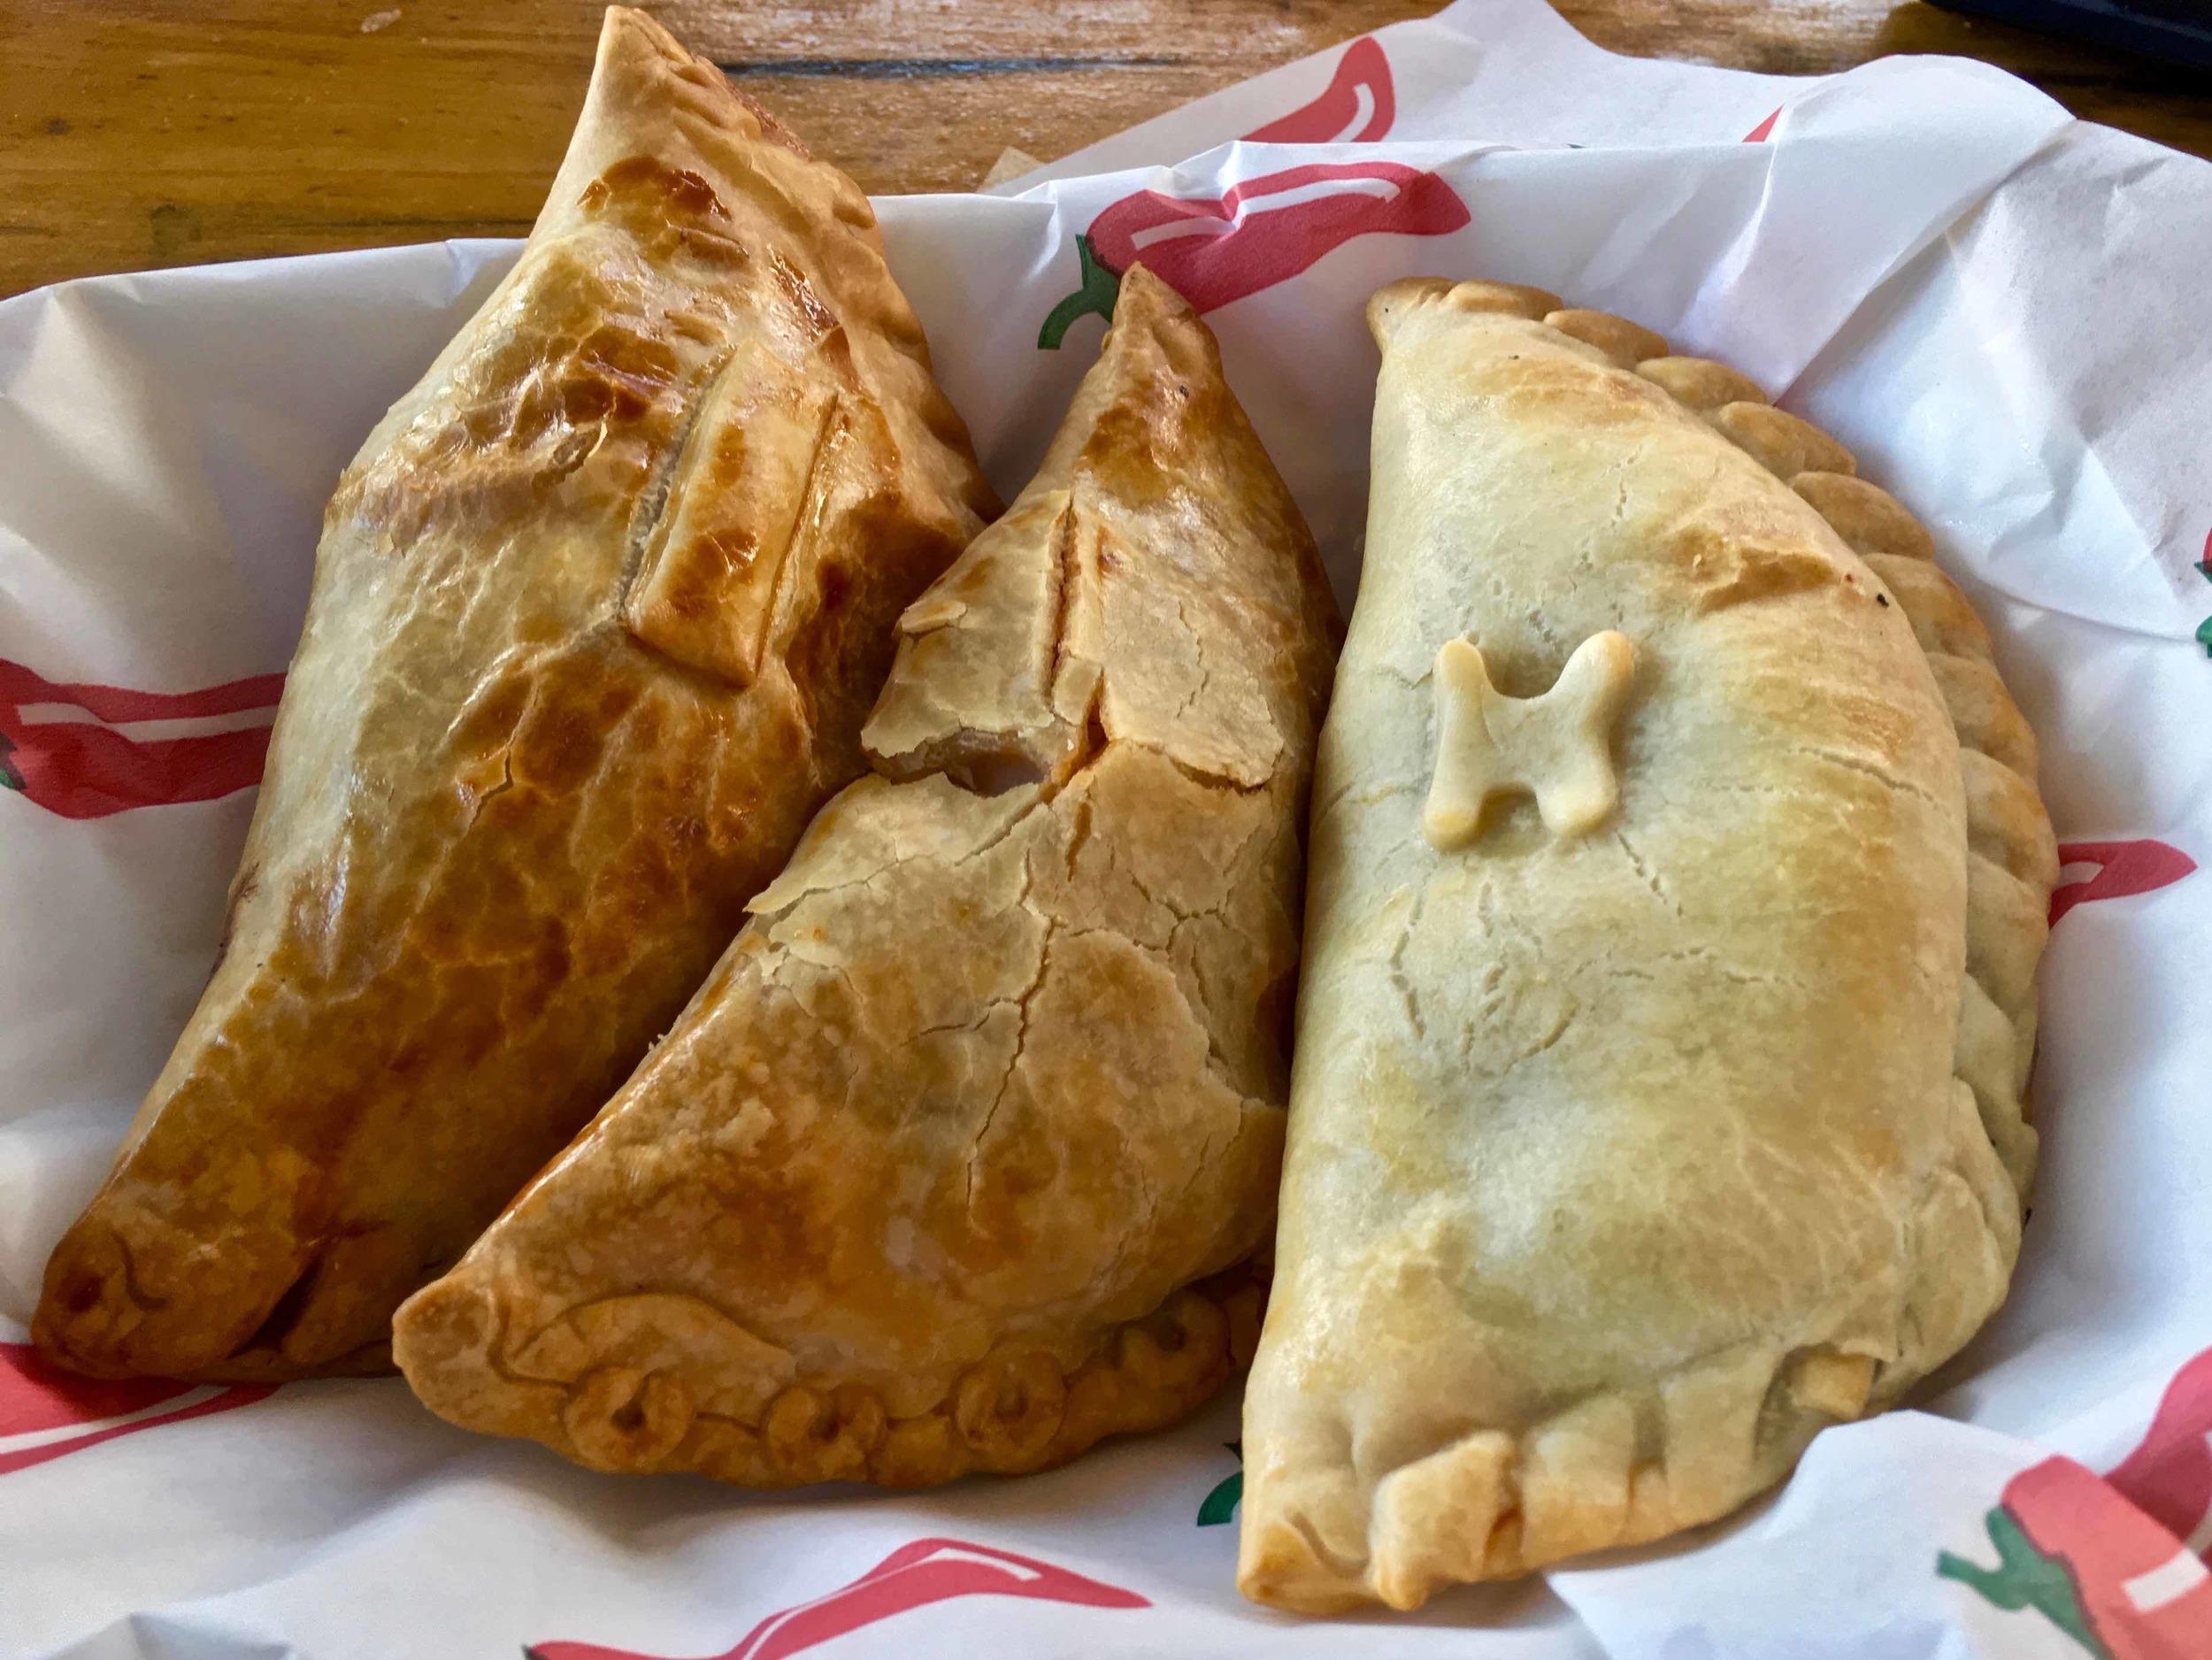 empanadas from Nucha food truck